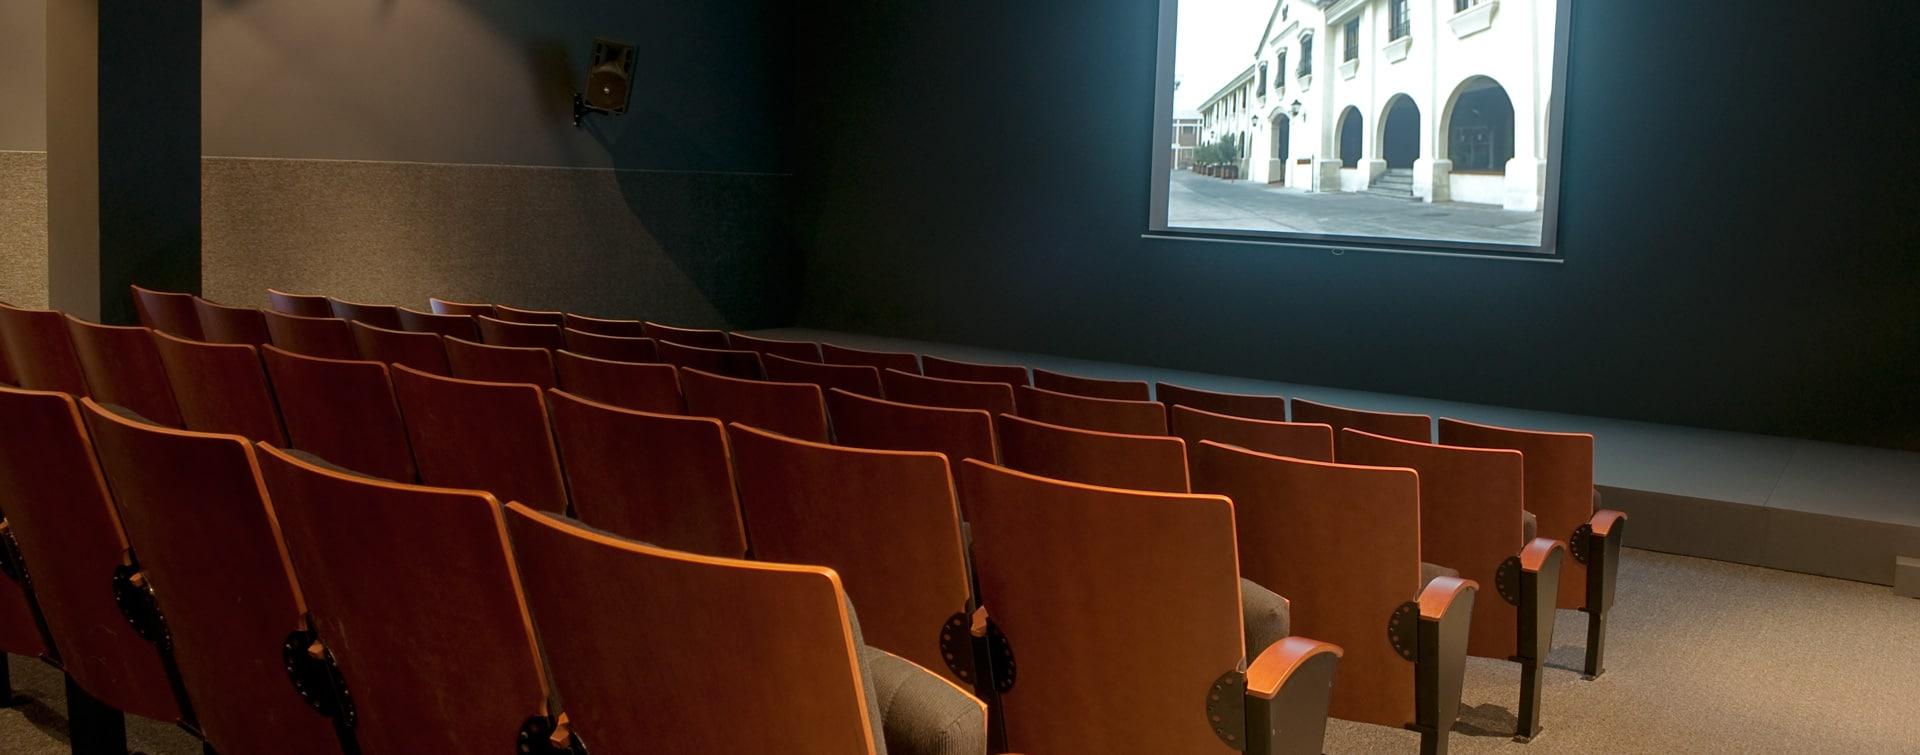 3 auditorio b